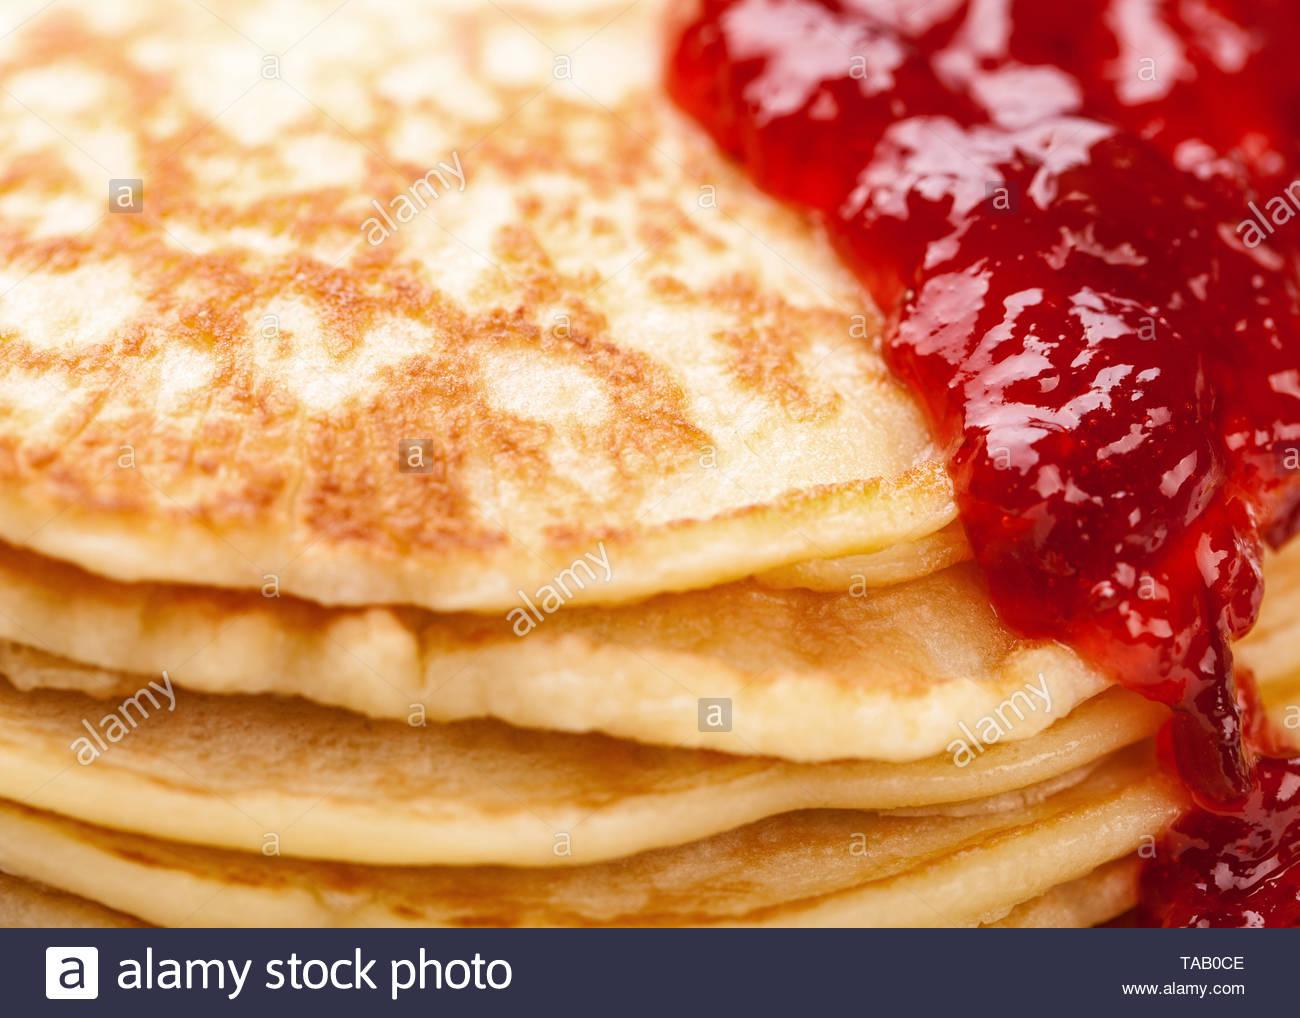 pancakes background with strawberry jam Stock Photo 247333534   Alamy 1300x1018